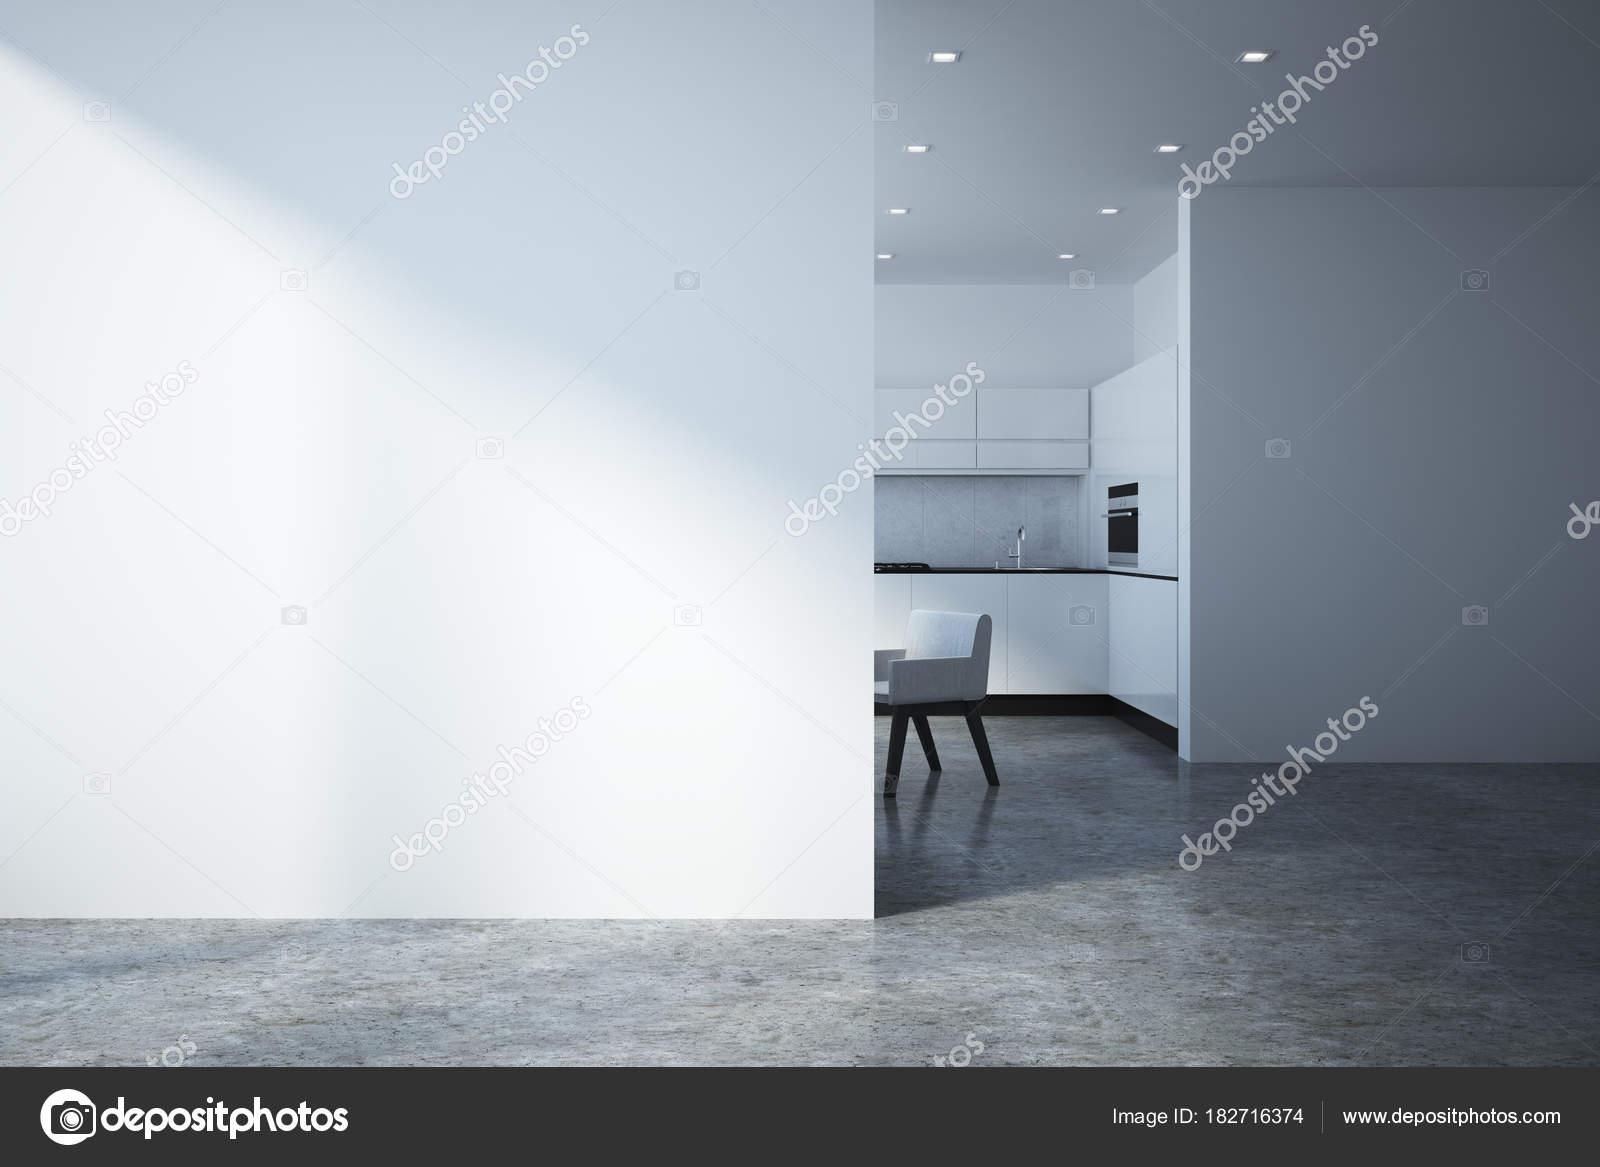 Moderne Küche Interieur mit leere Wand — Stockfoto © peshkova #182716374